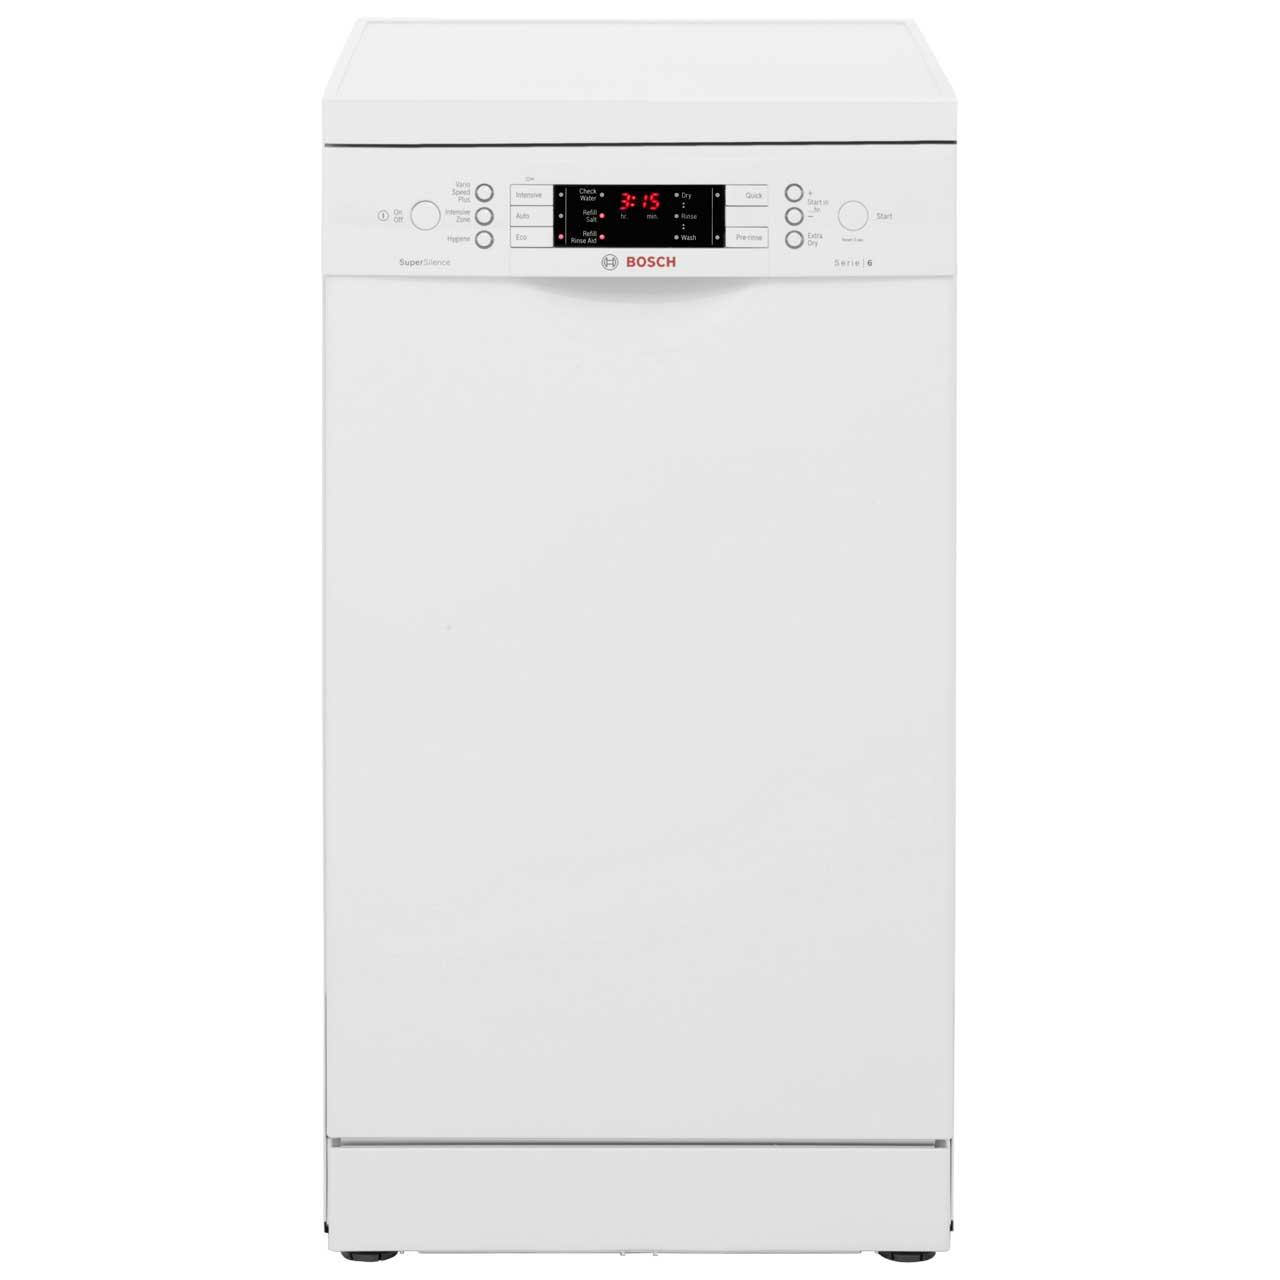 Bosch Serie 6 SPS59T02GB Free Standing Slimline Dishwasher in White